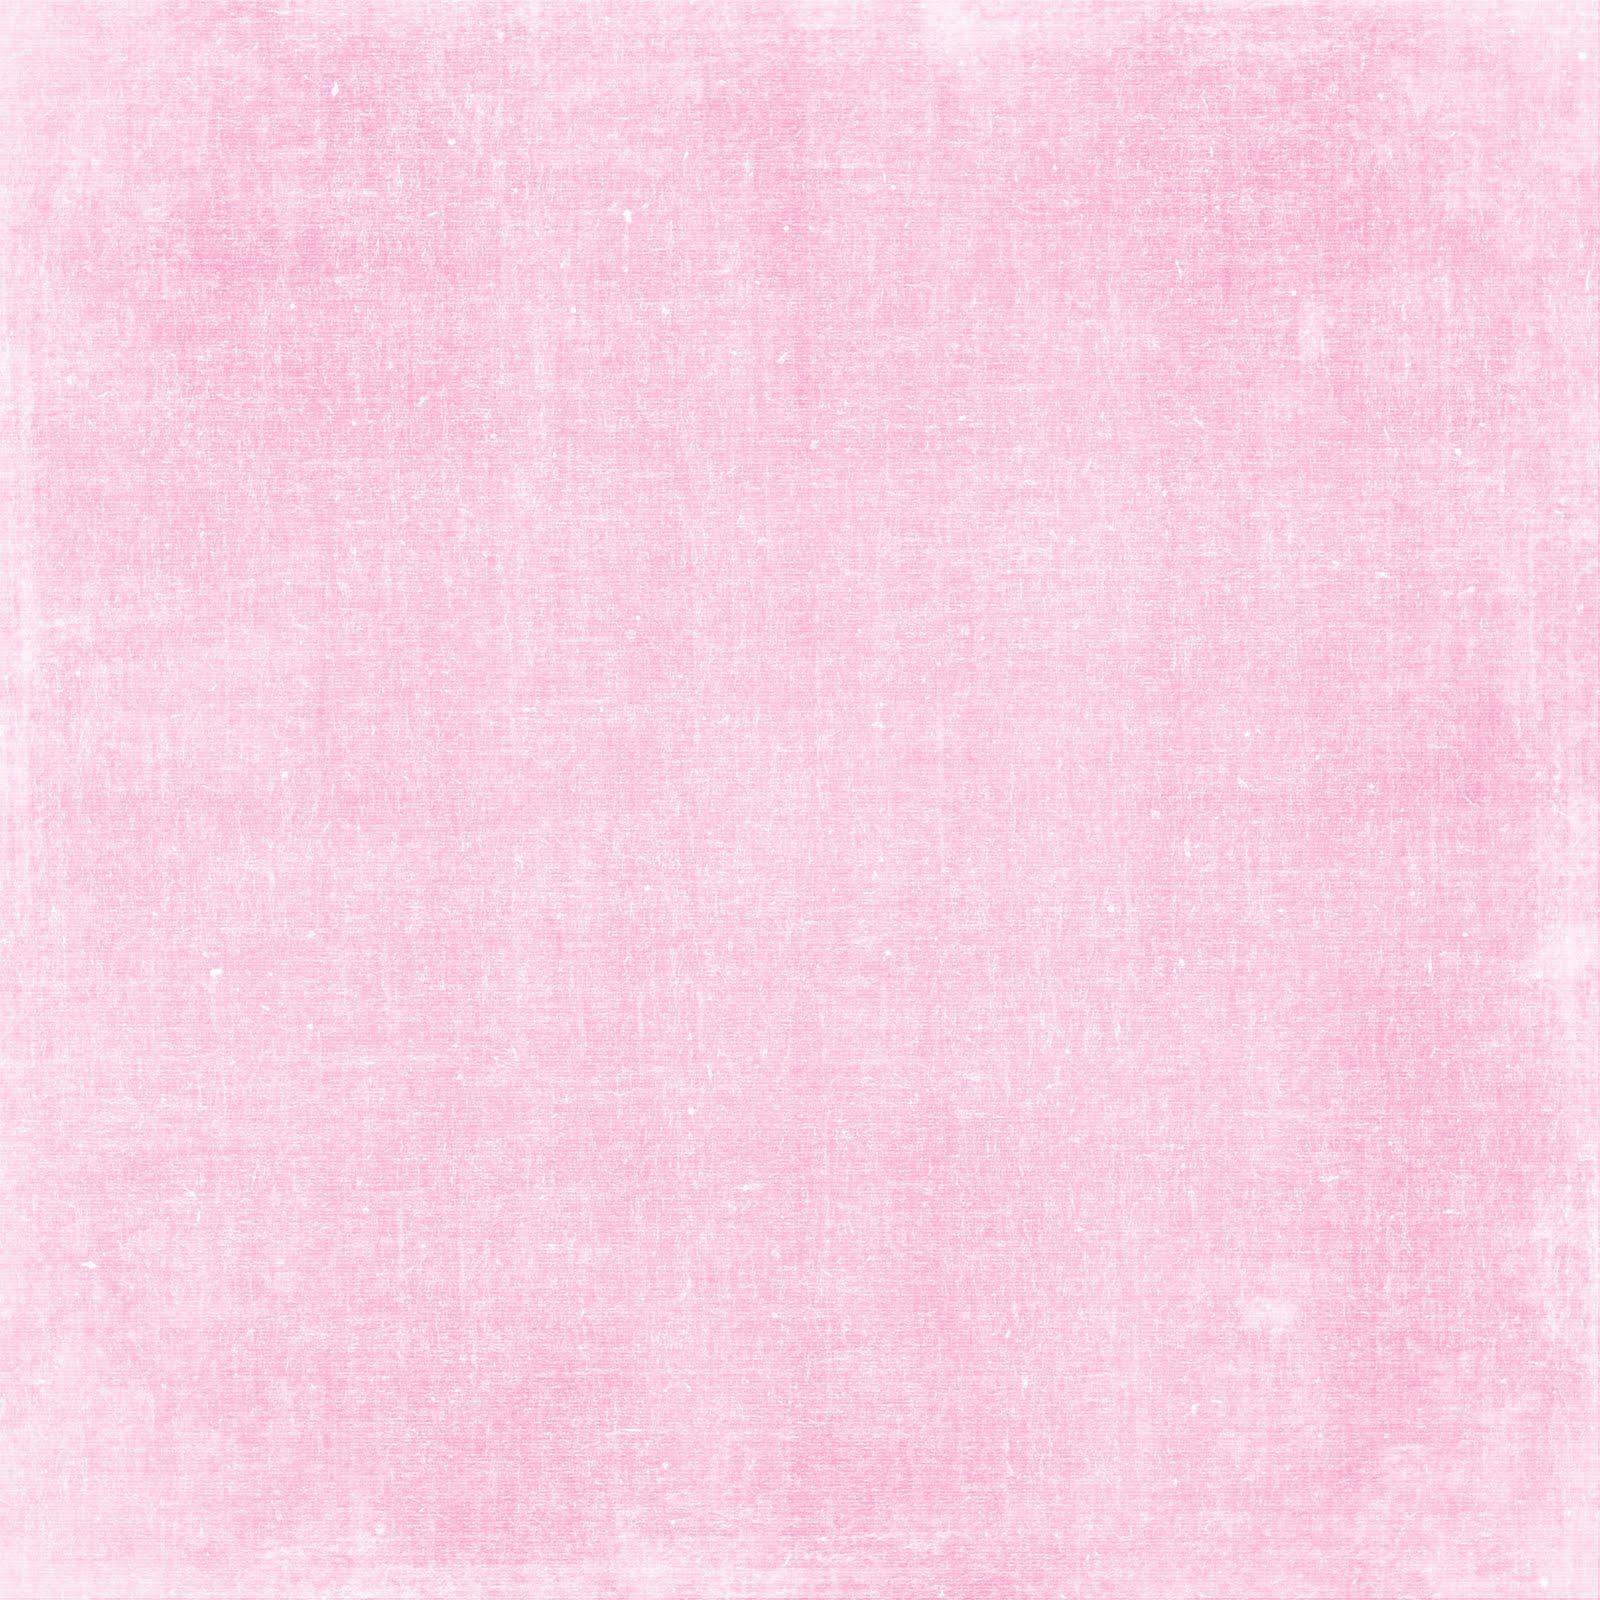 http://1.bp.blogspot.com/_omiG-WZLpN4/TMwyvuLgcYI/AAAAAAAABHE/AkNrOJem9AE/s1600/SP_SpringBreeze_Paper_Pink.jpg